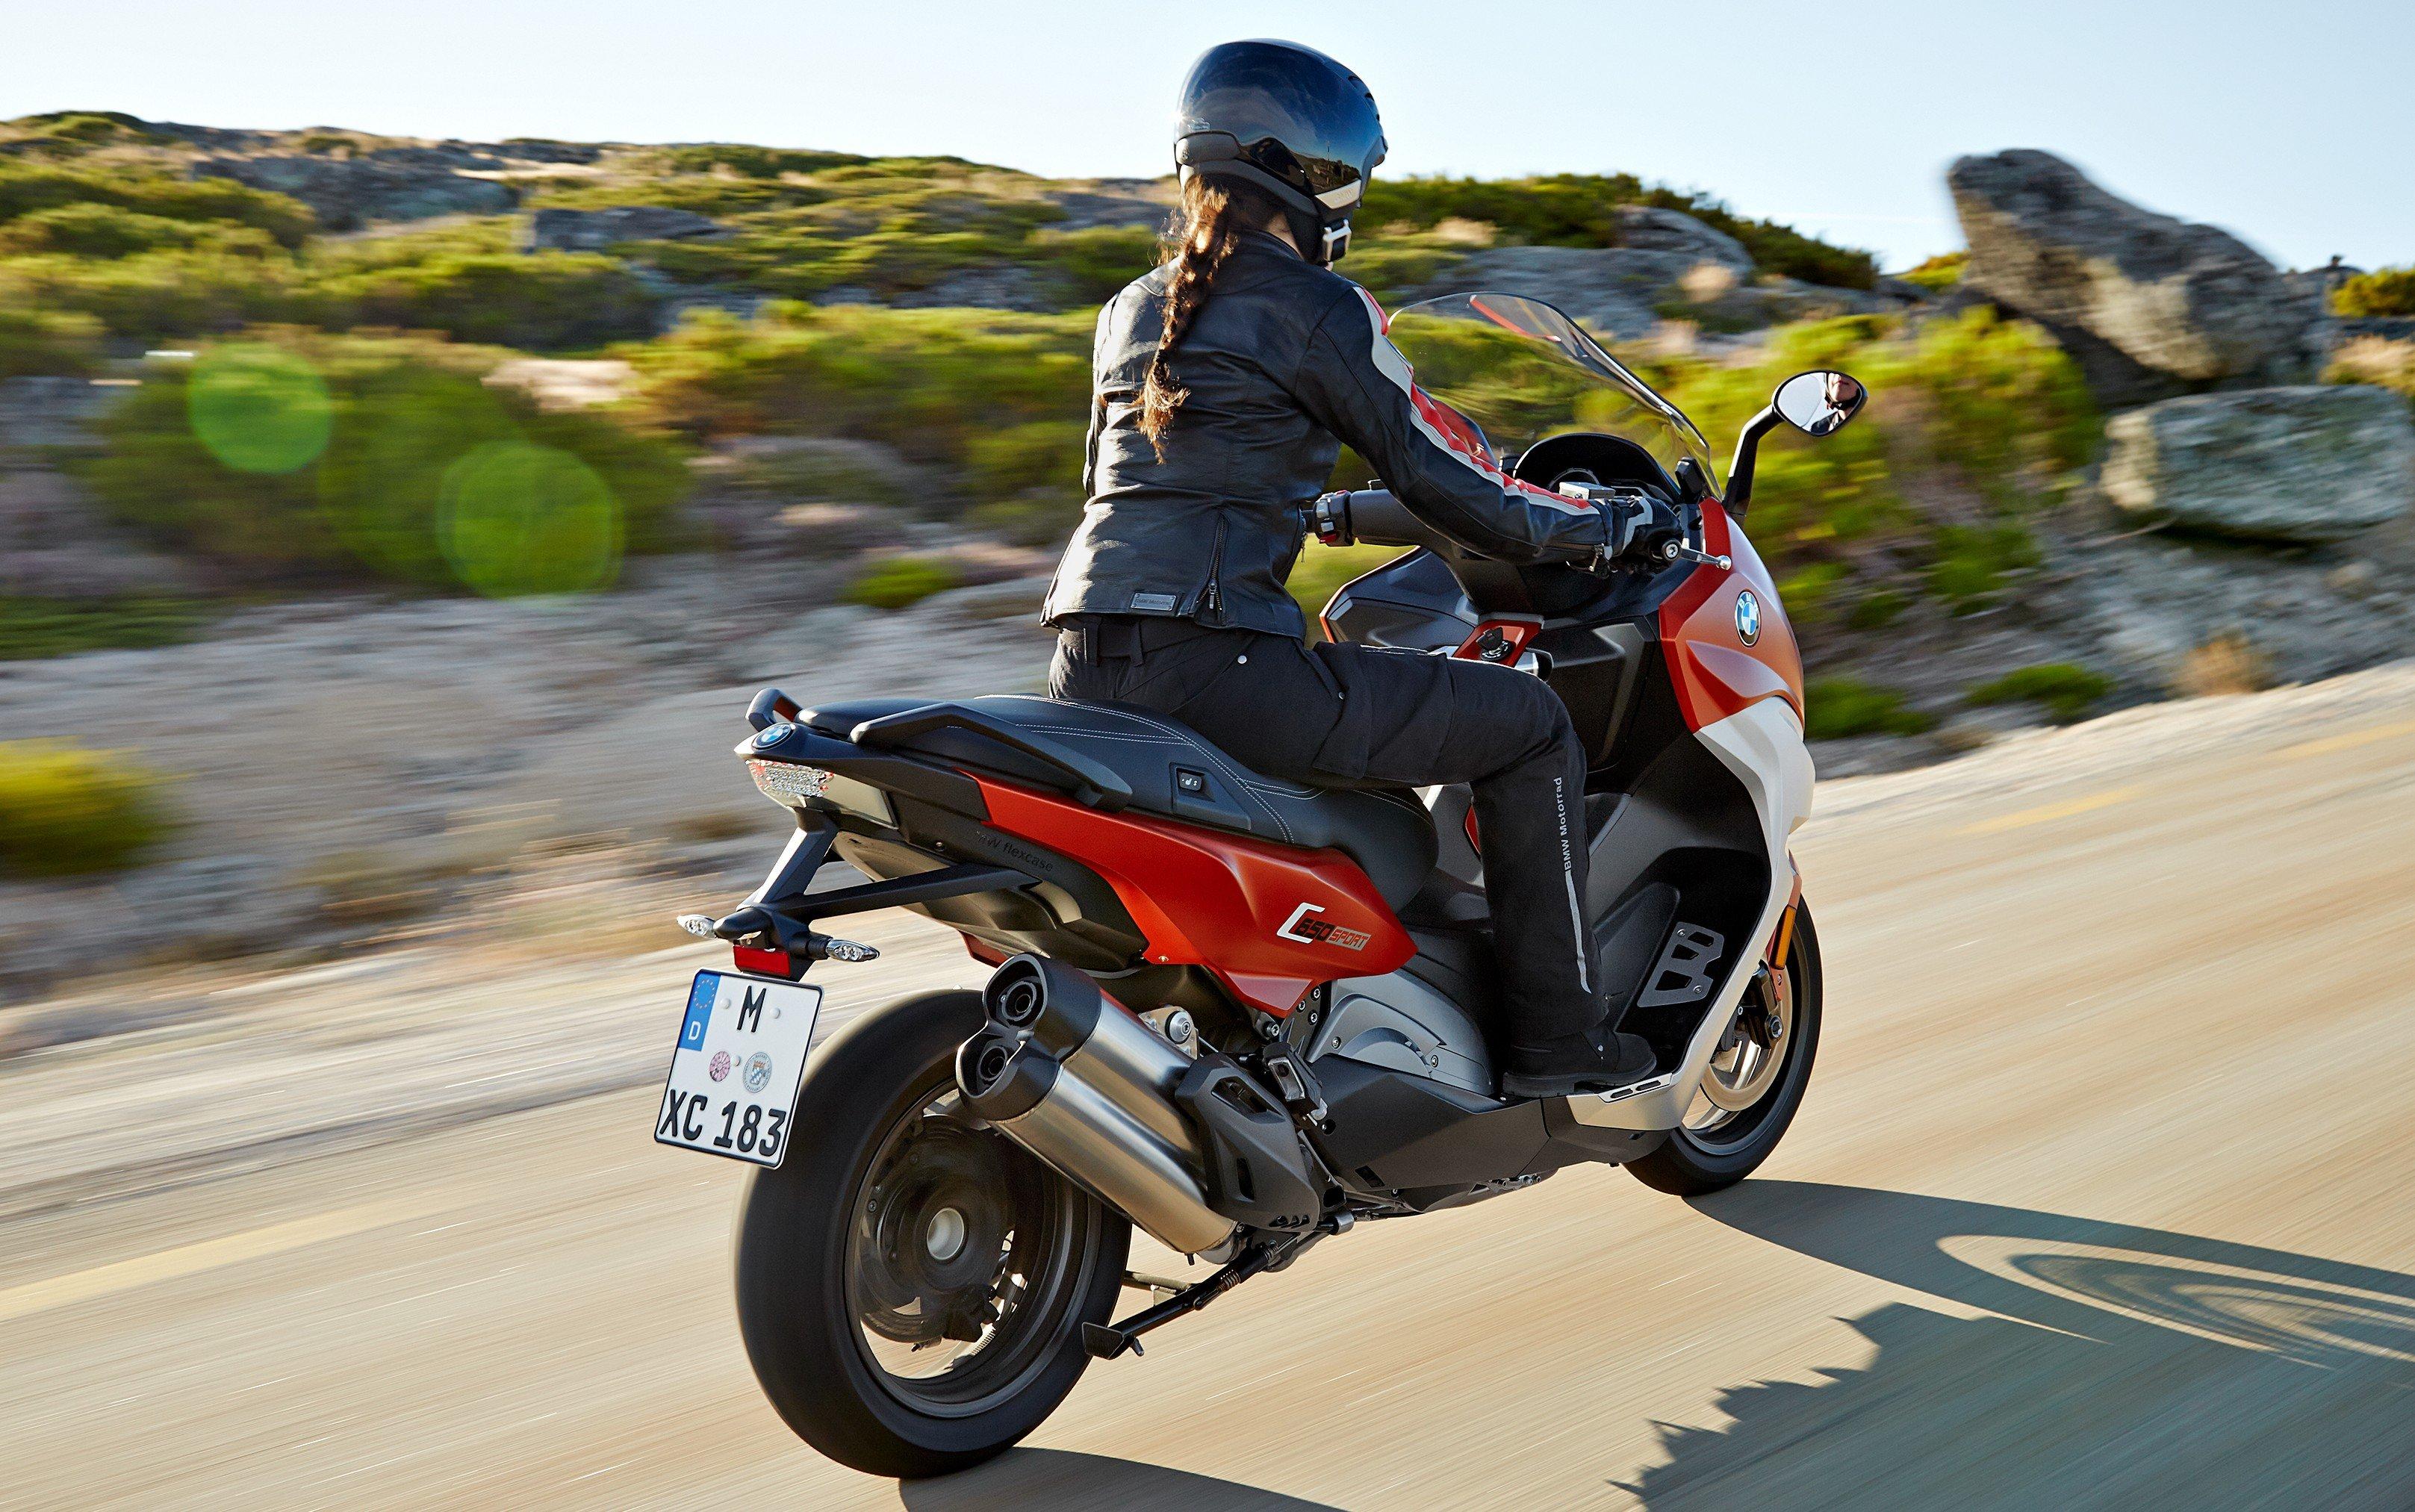 bmw c 650 sport c 650 gt maxi scooters revealed image 382003. Black Bedroom Furniture Sets. Home Design Ideas